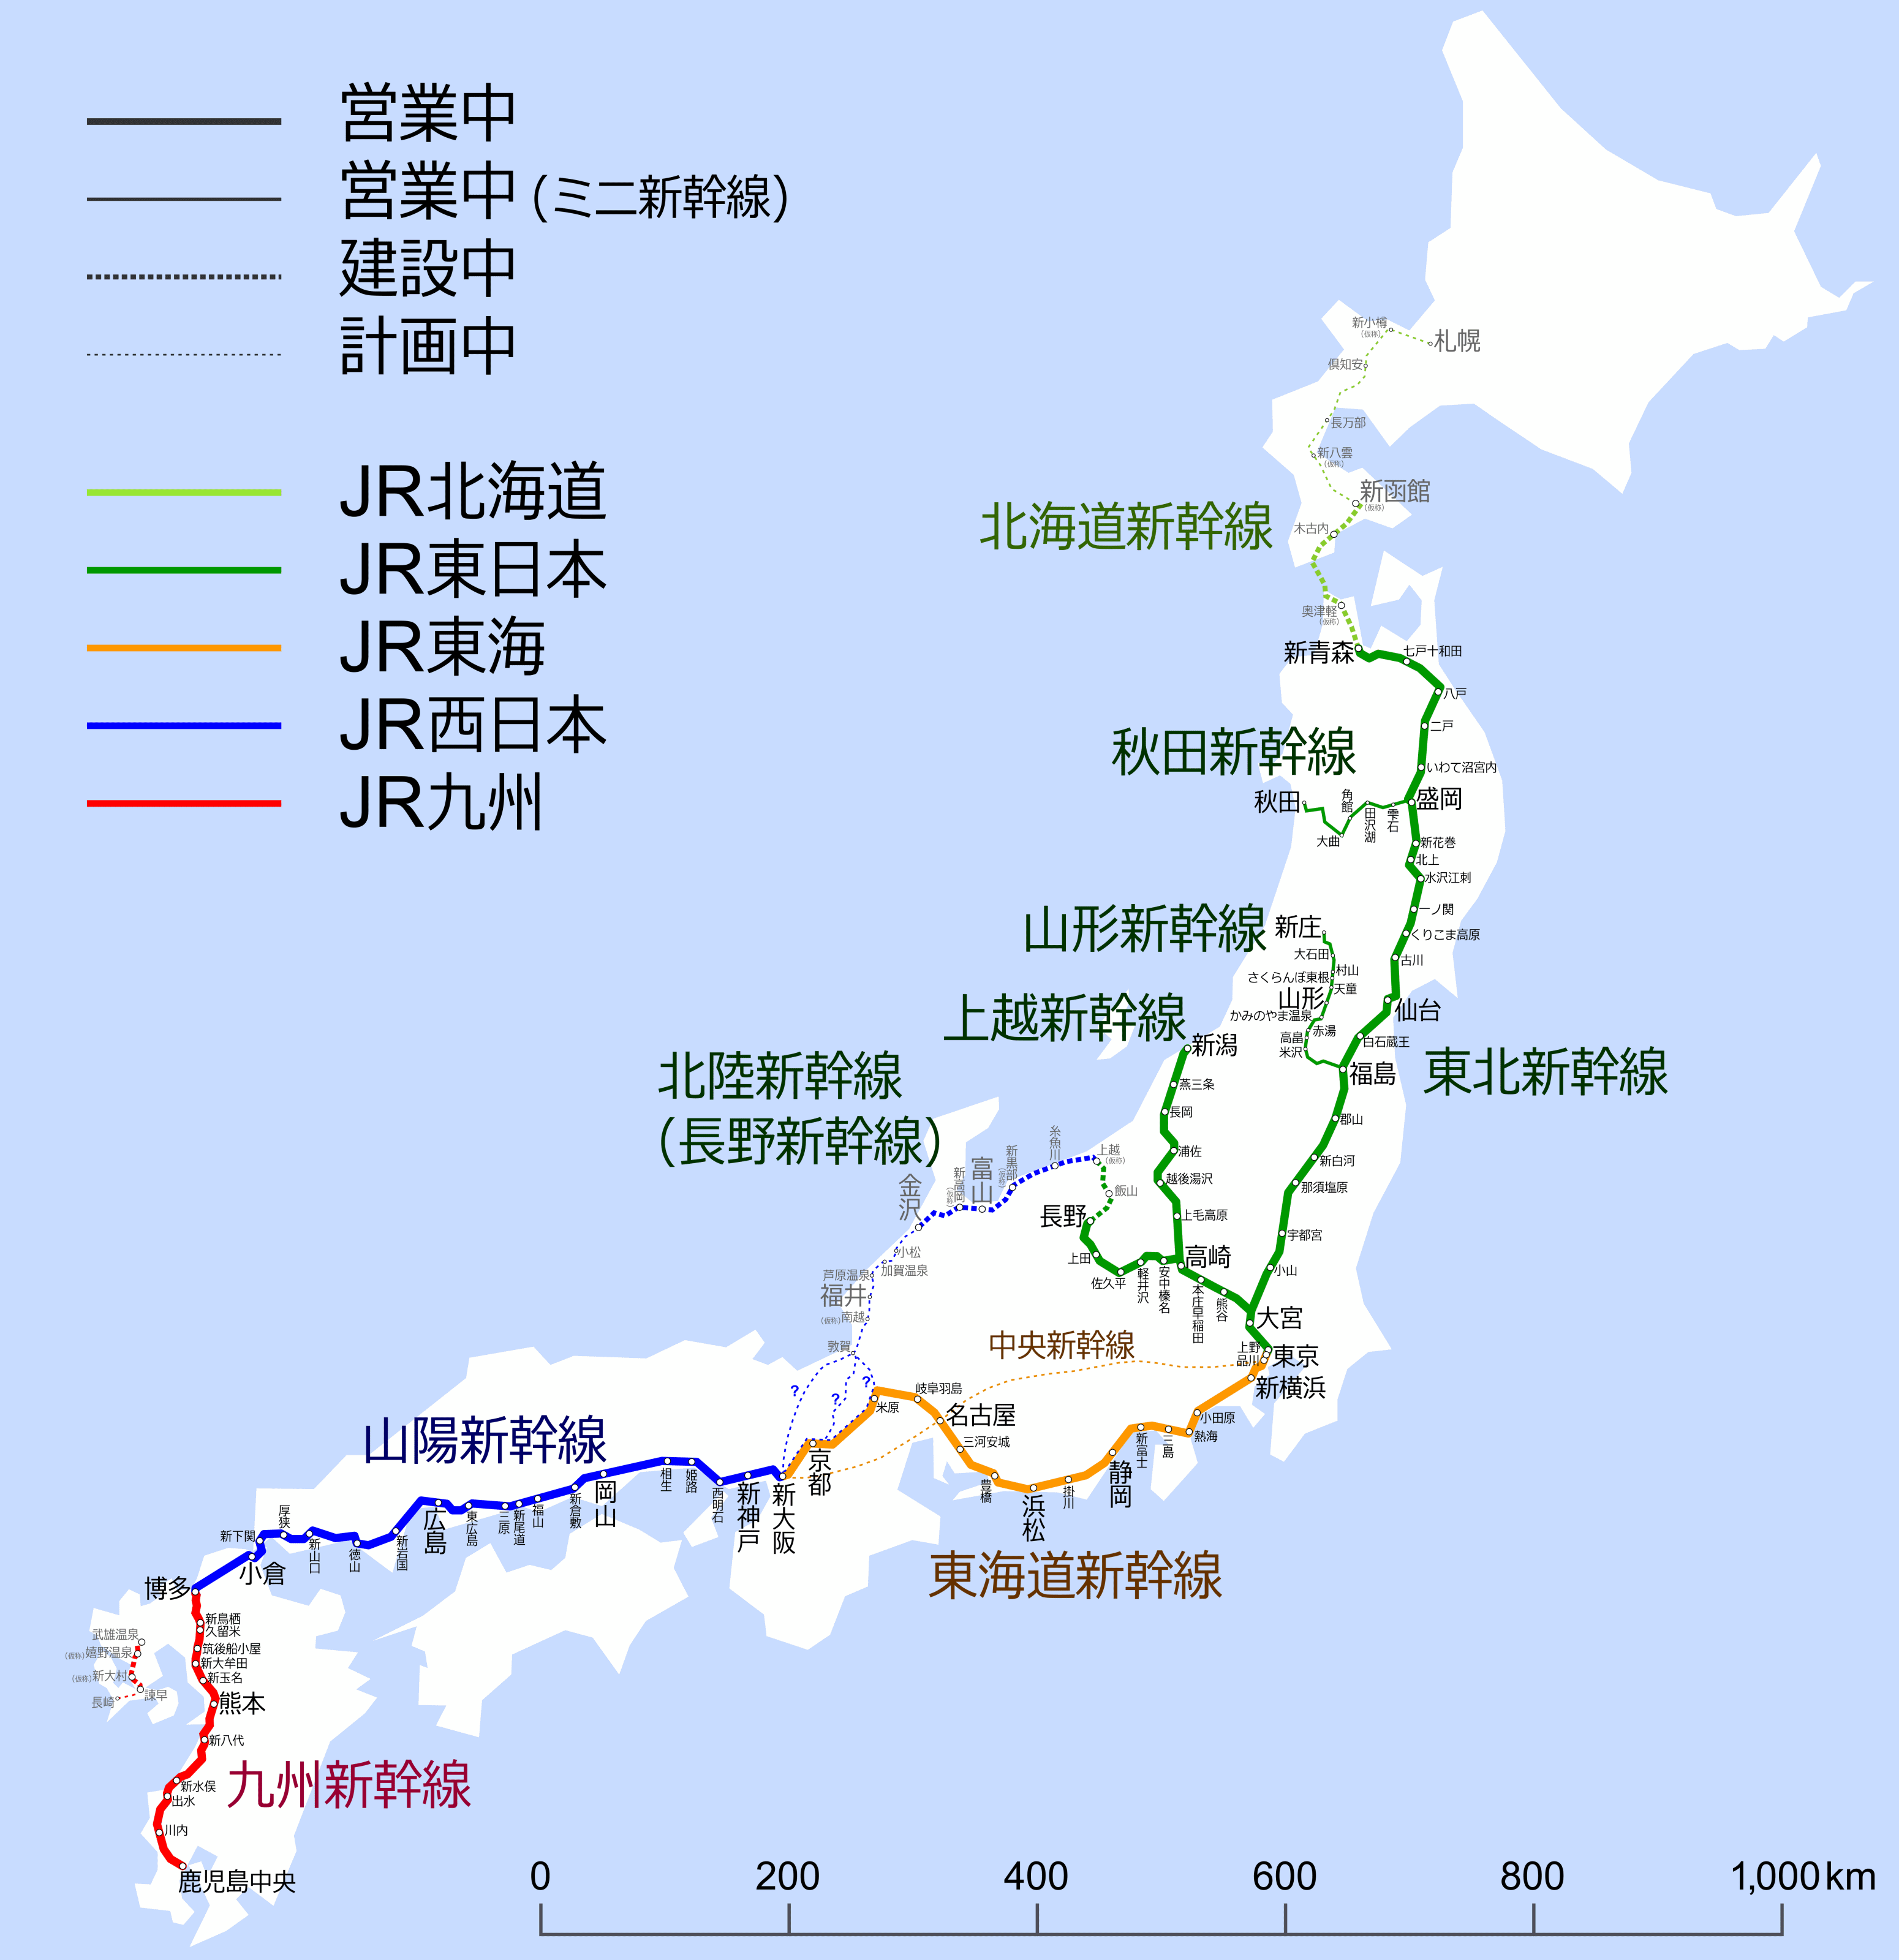 JR東海道新幹線の路線図 - NAVITIME